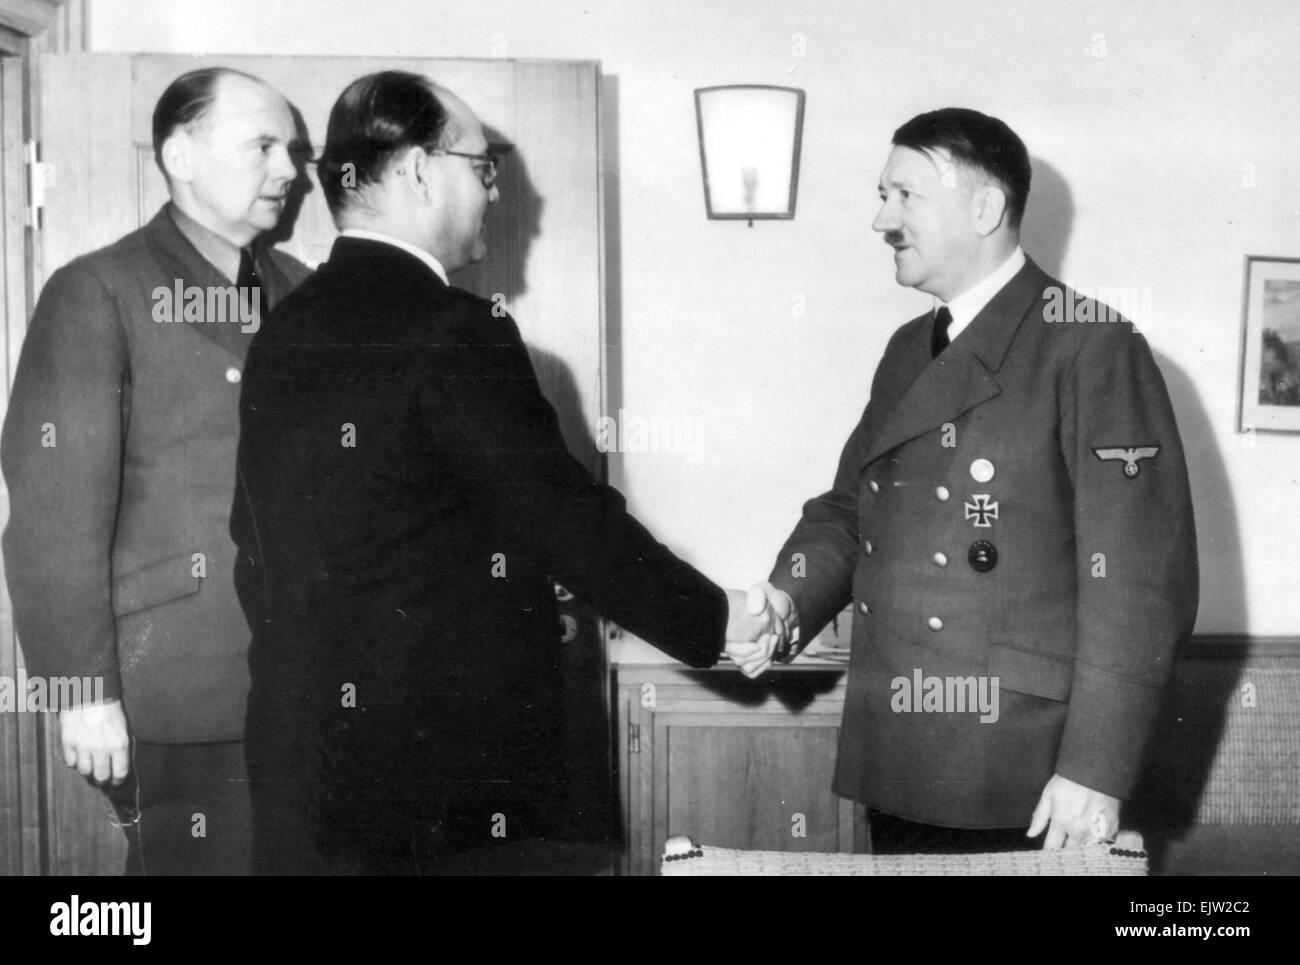 Indian nationalist leader Subhash Chandra Bose and Adolf Hitler, Berlin, Germany, May 1942 - Stock Image